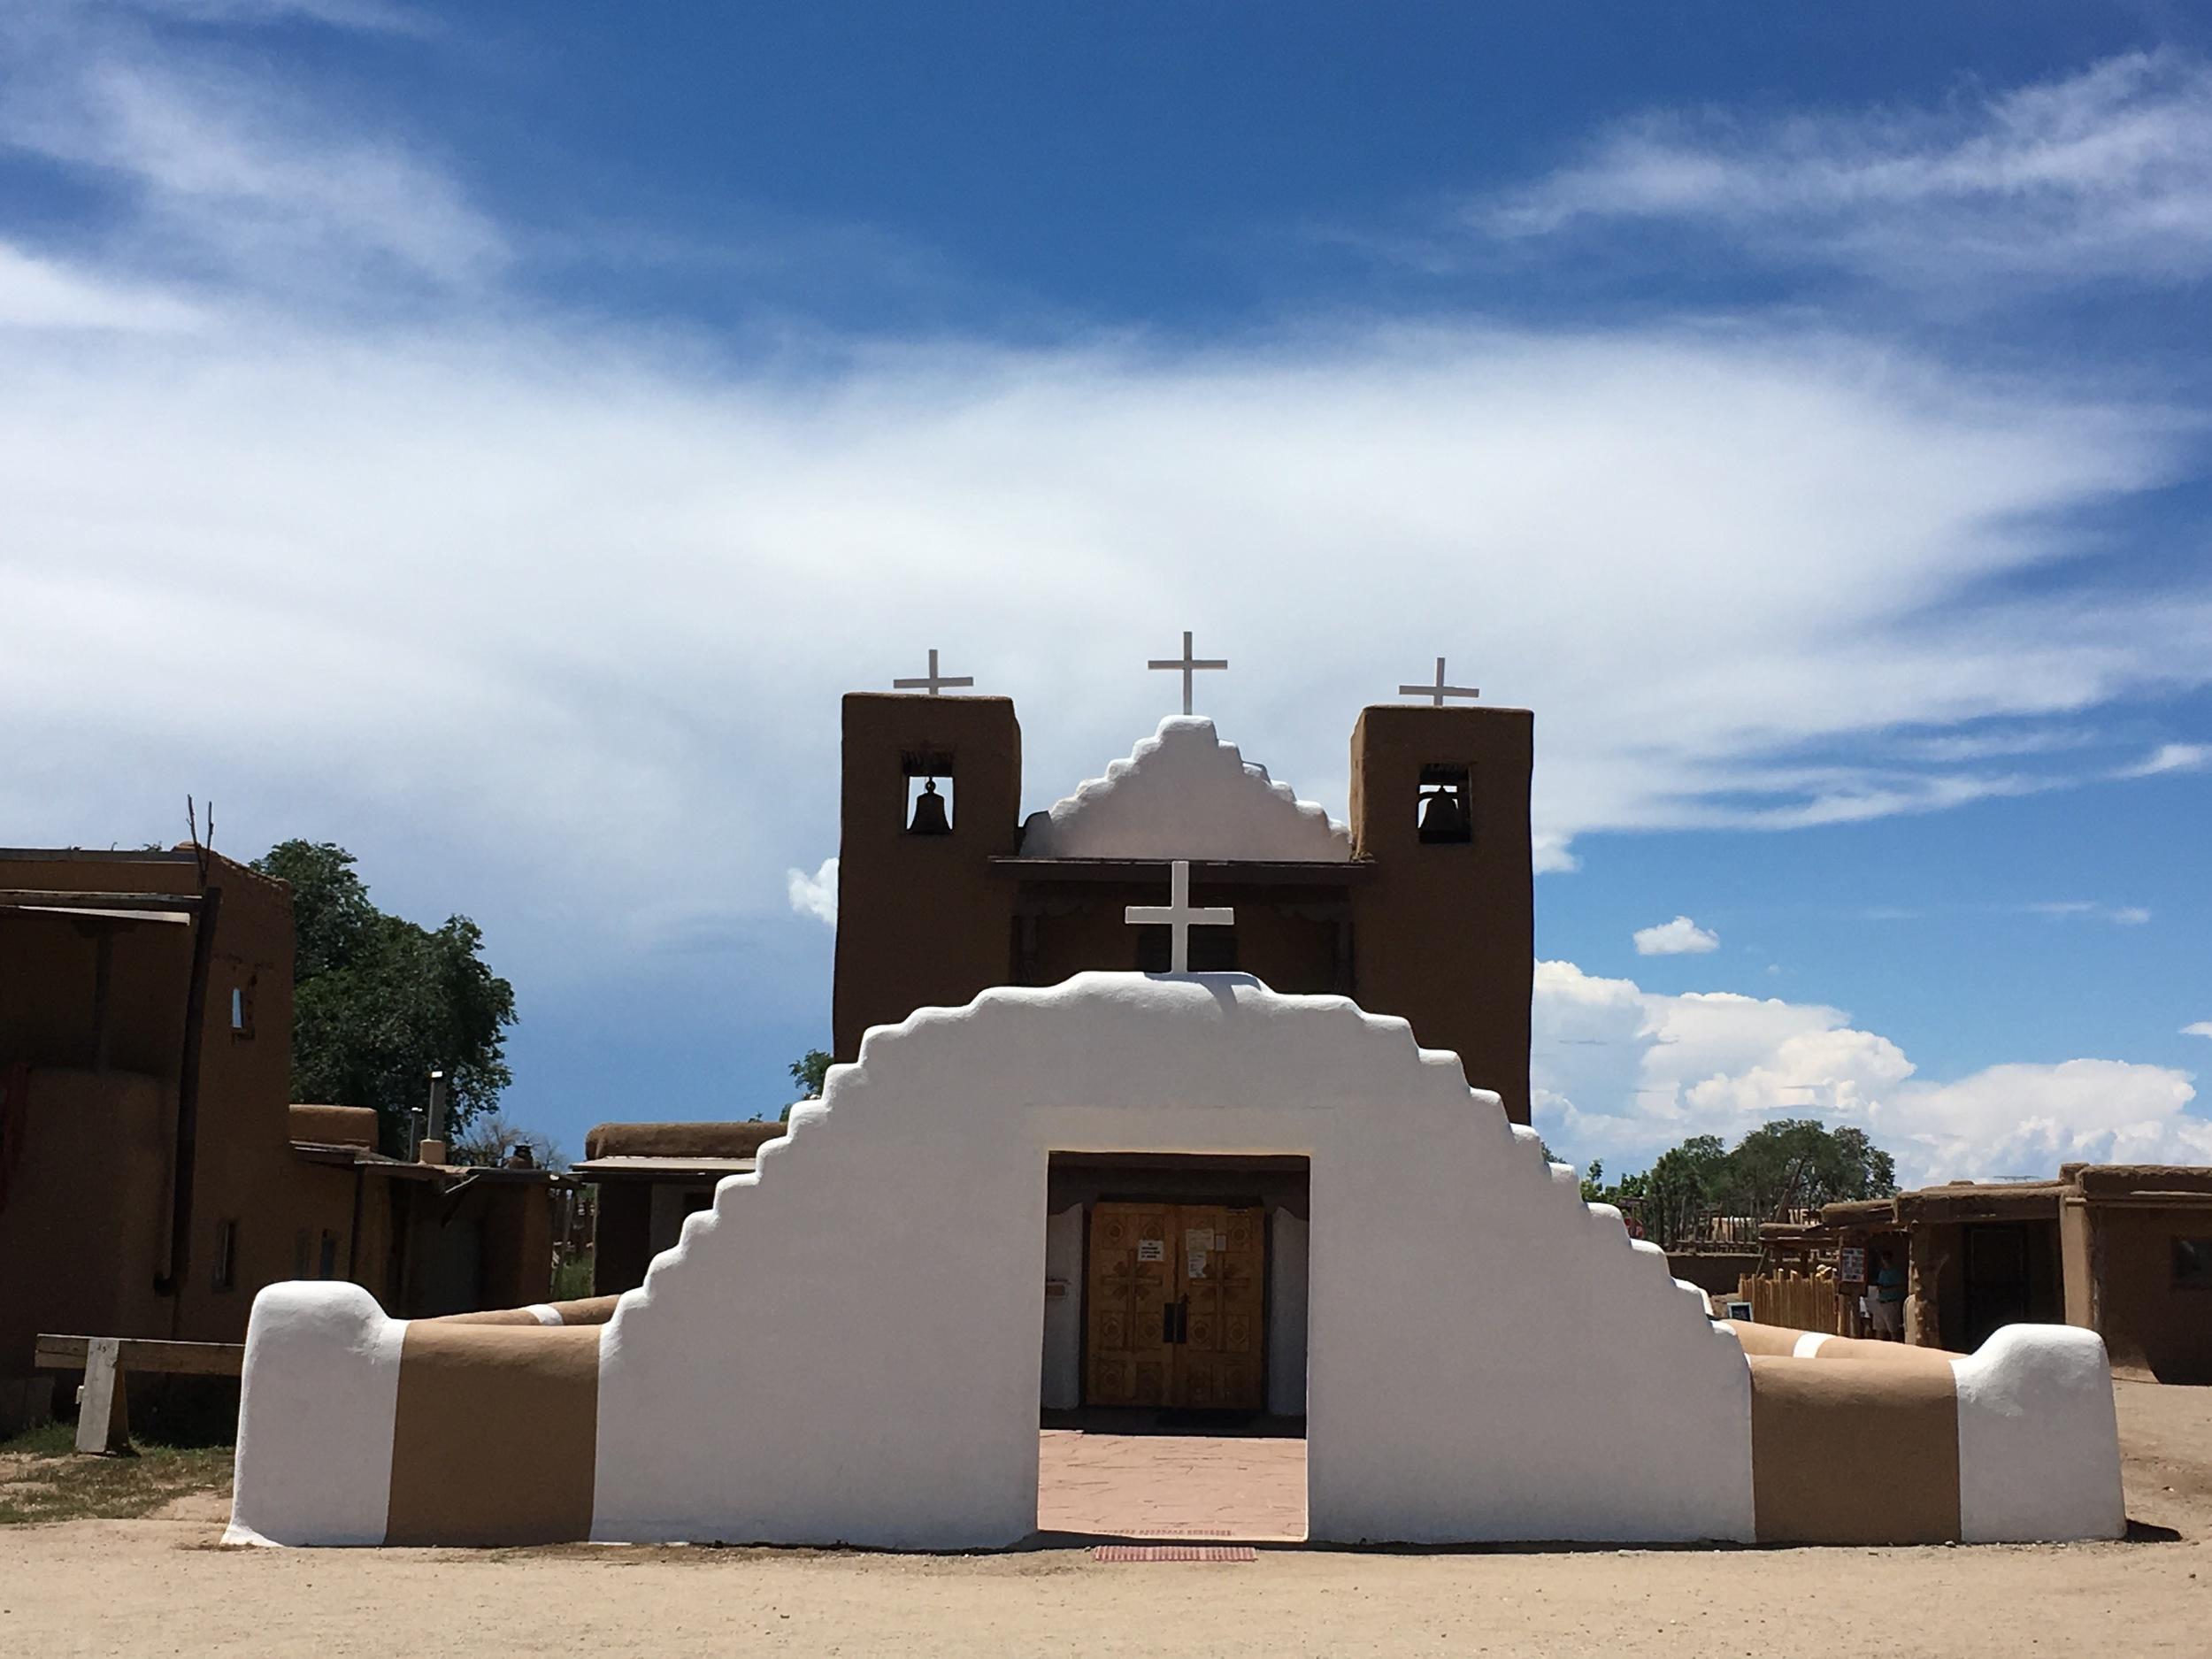 New church at Taos Pueblo